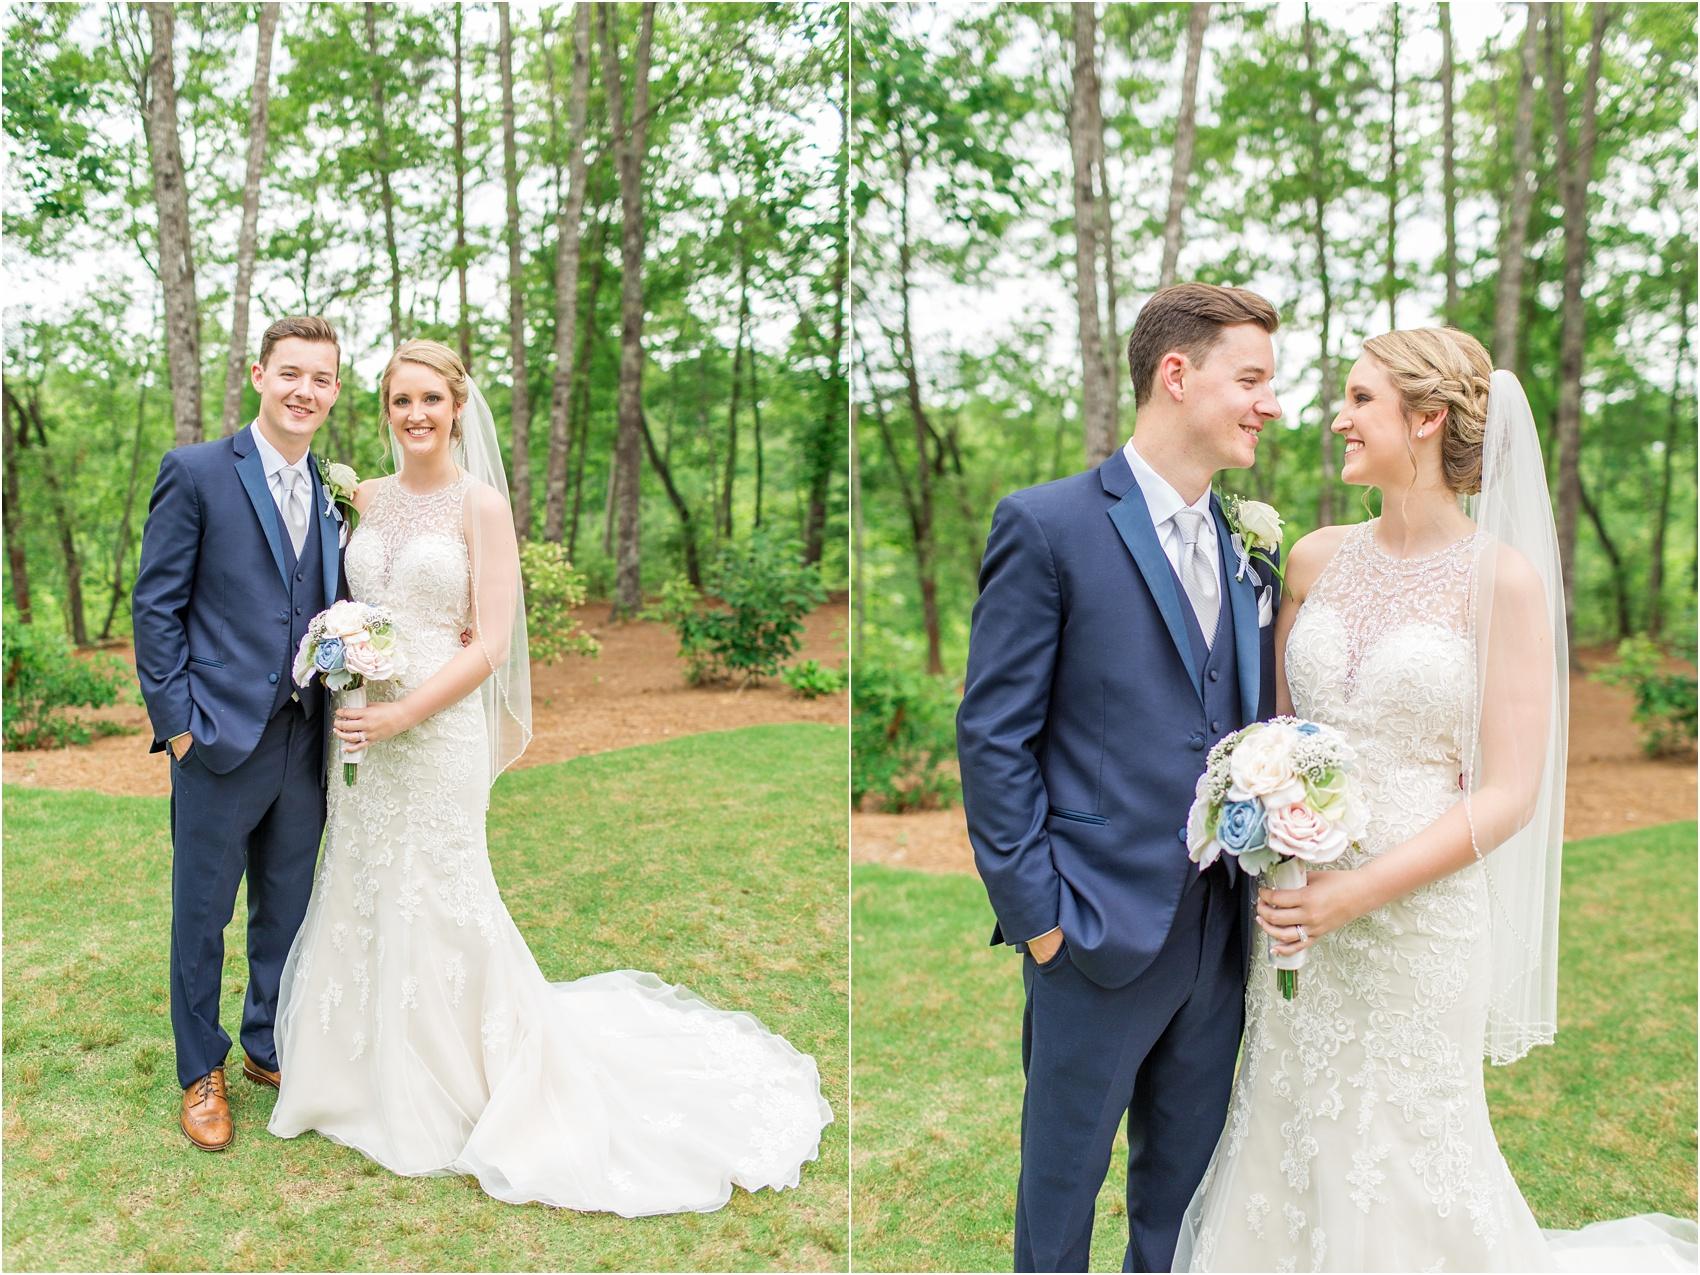 Savannah Eve Photography- Roper-Powell Wedding- Blog-39.jpg